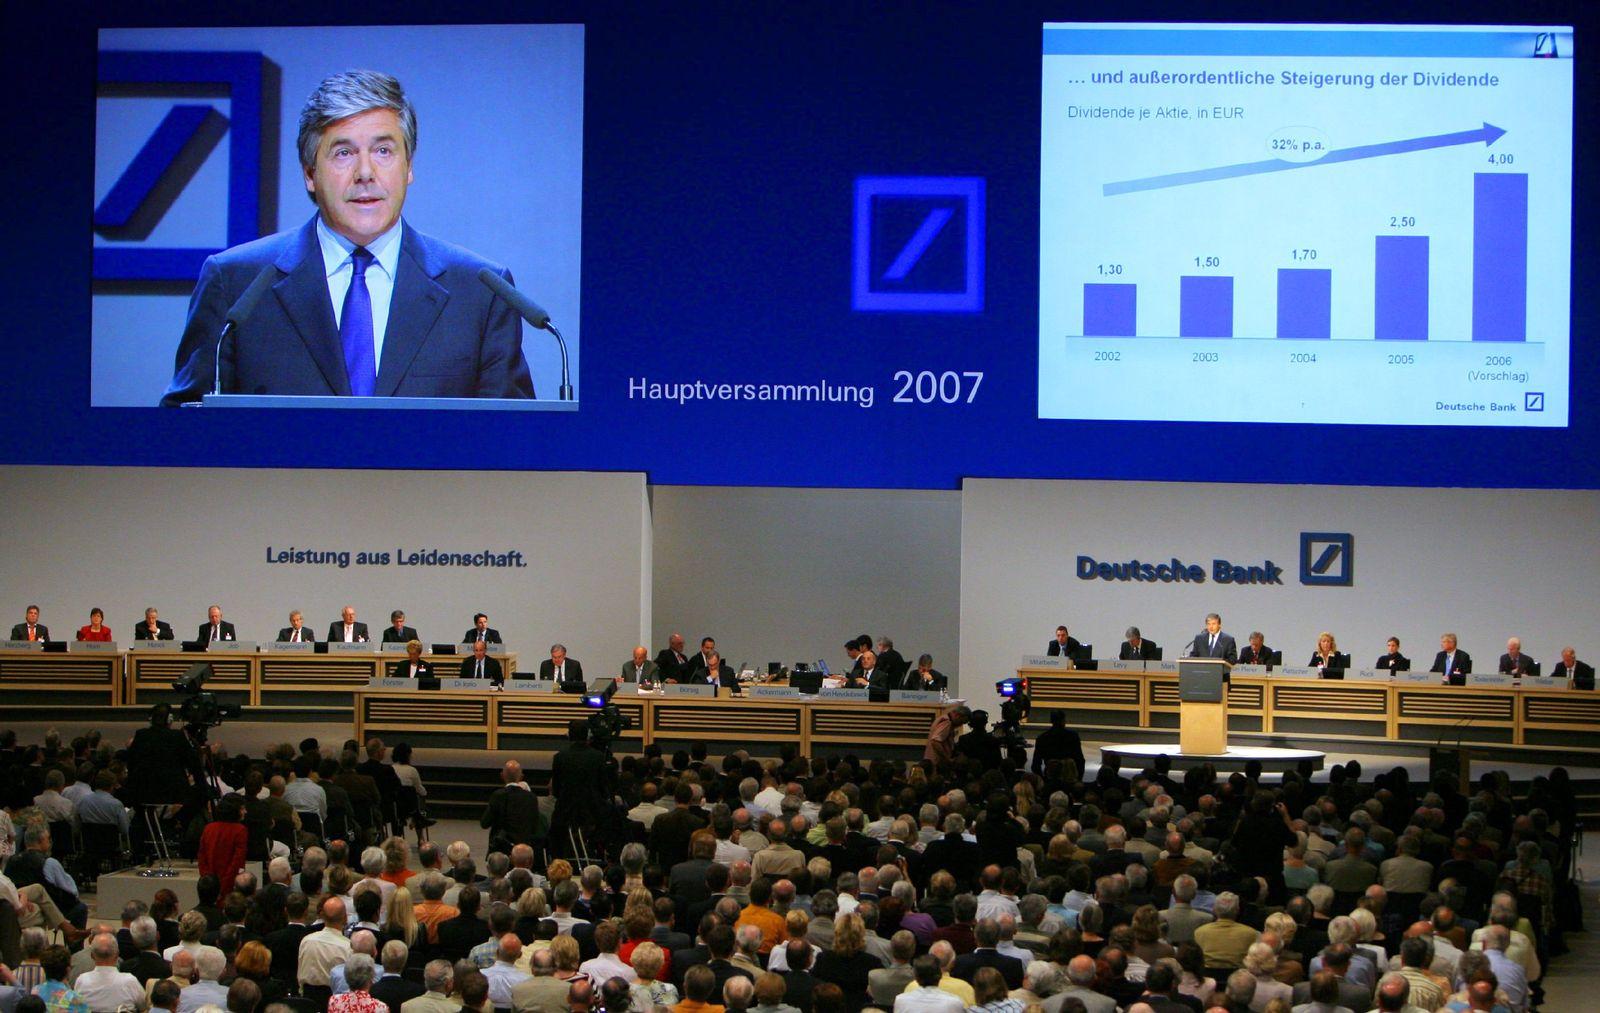 Hauptversammlung Deutsche Bank in Frankfurt